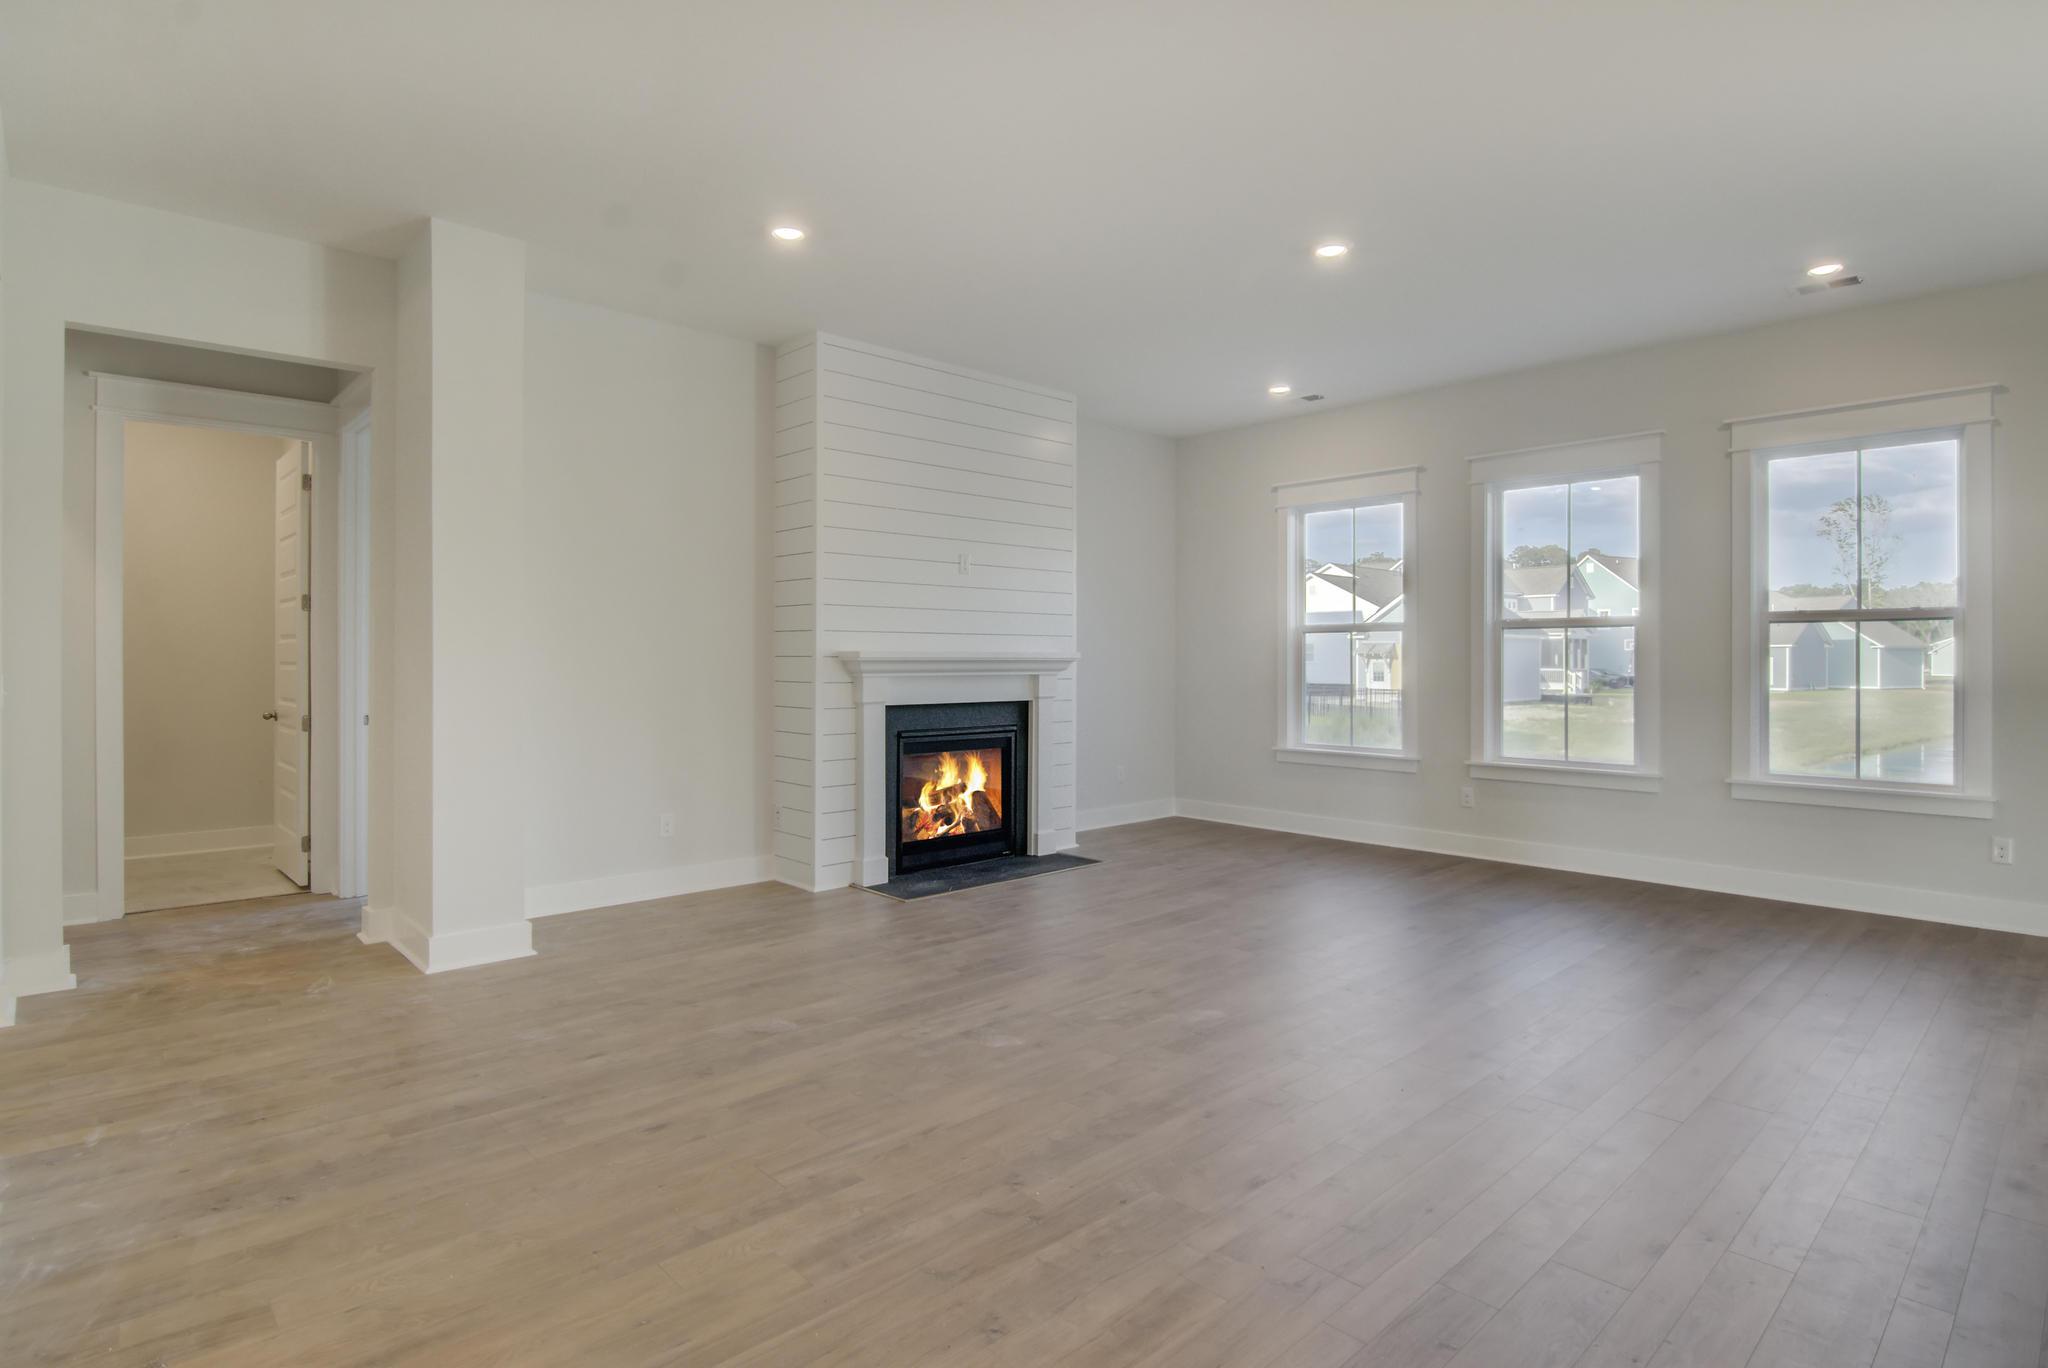 Carolina Park Homes For Sale - 1734 Sandy Brook, Mount Pleasant, SC - 13